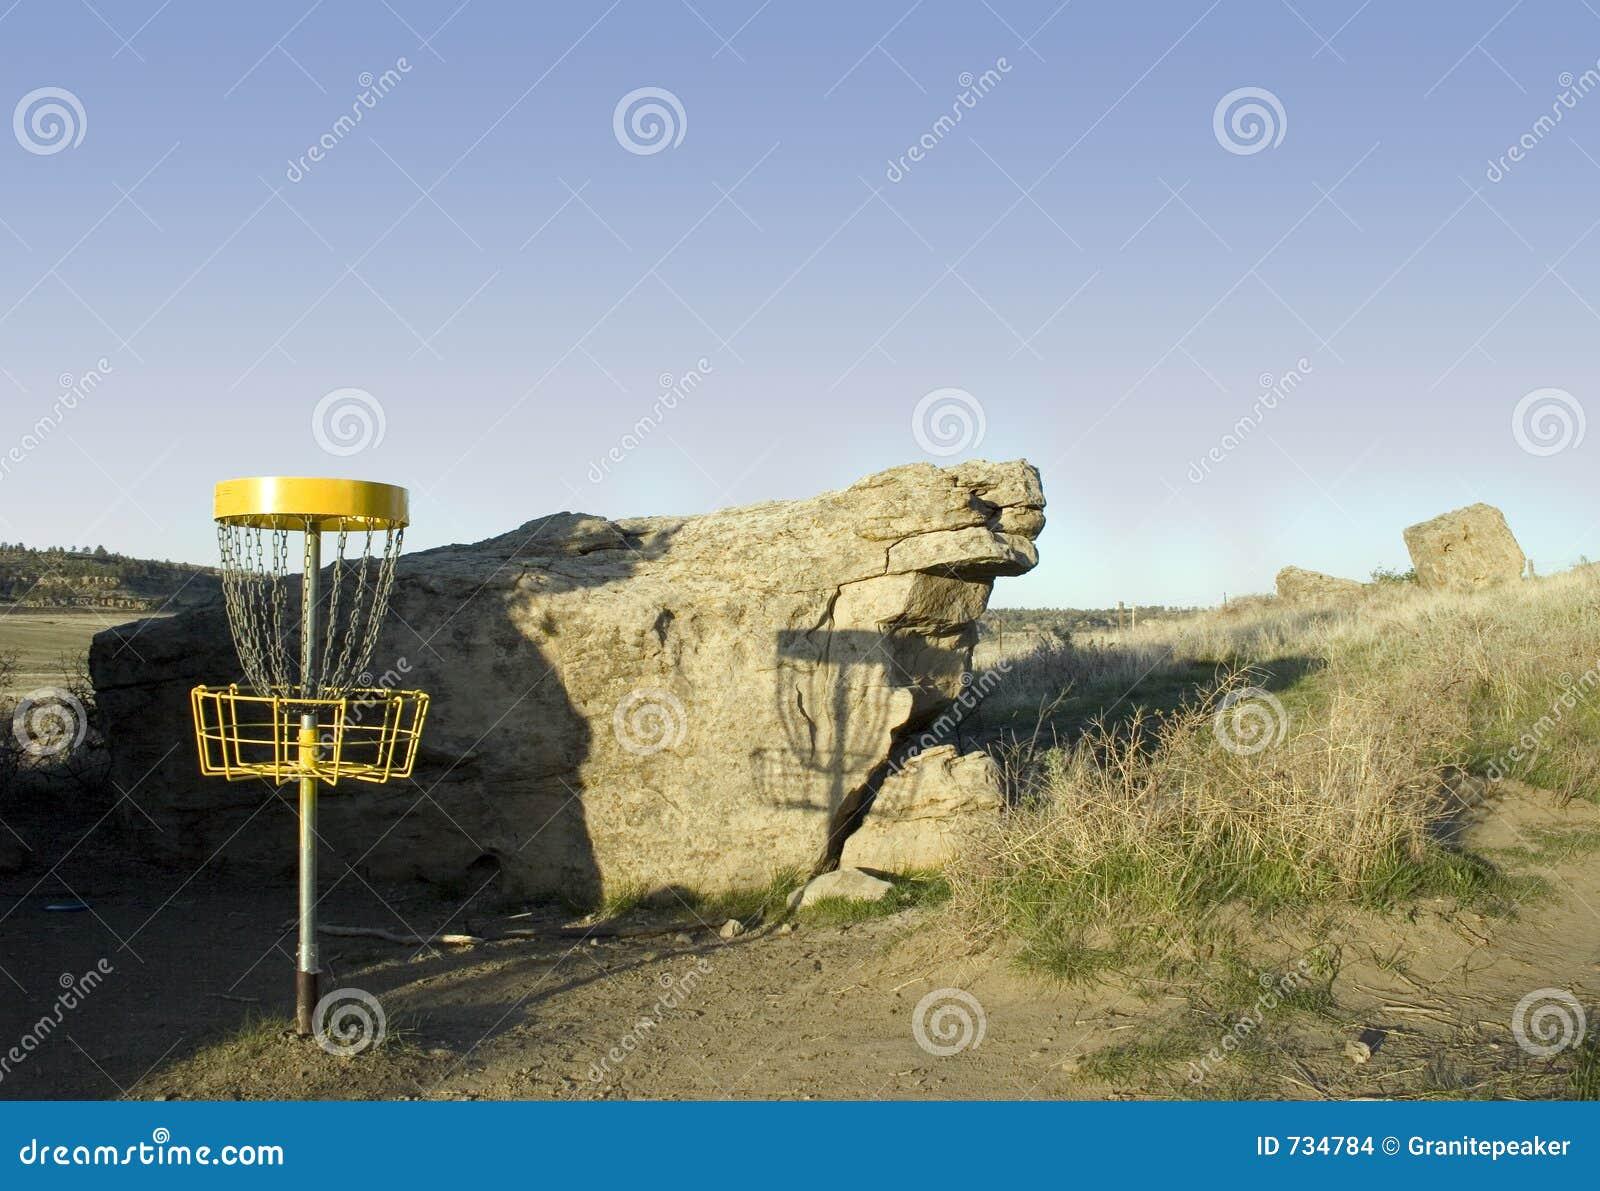 Frisbee Golf Clip Art Frisbee golf - folf